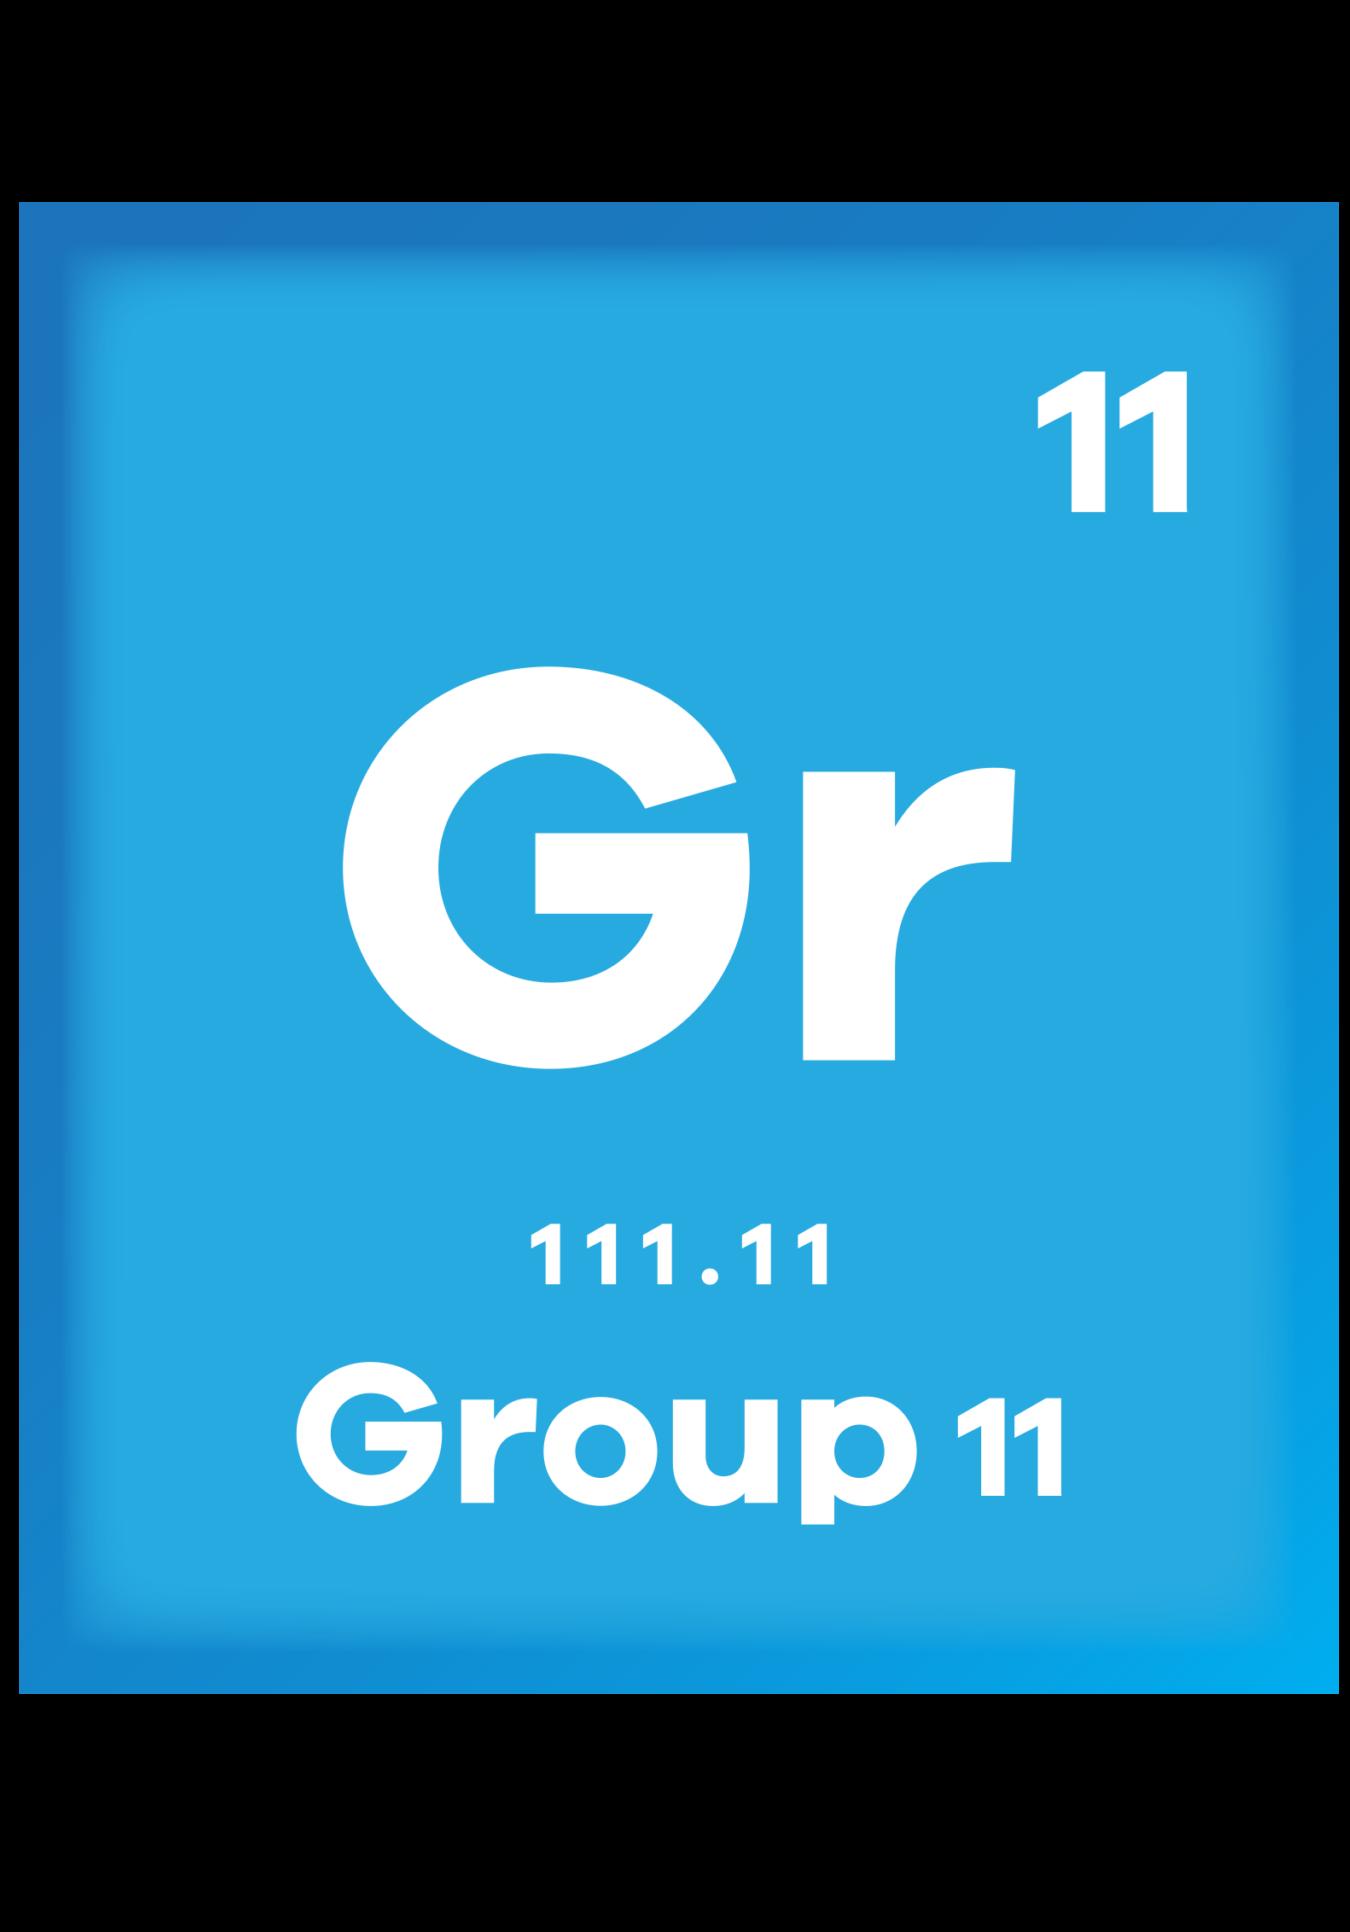 Group 11 Logo